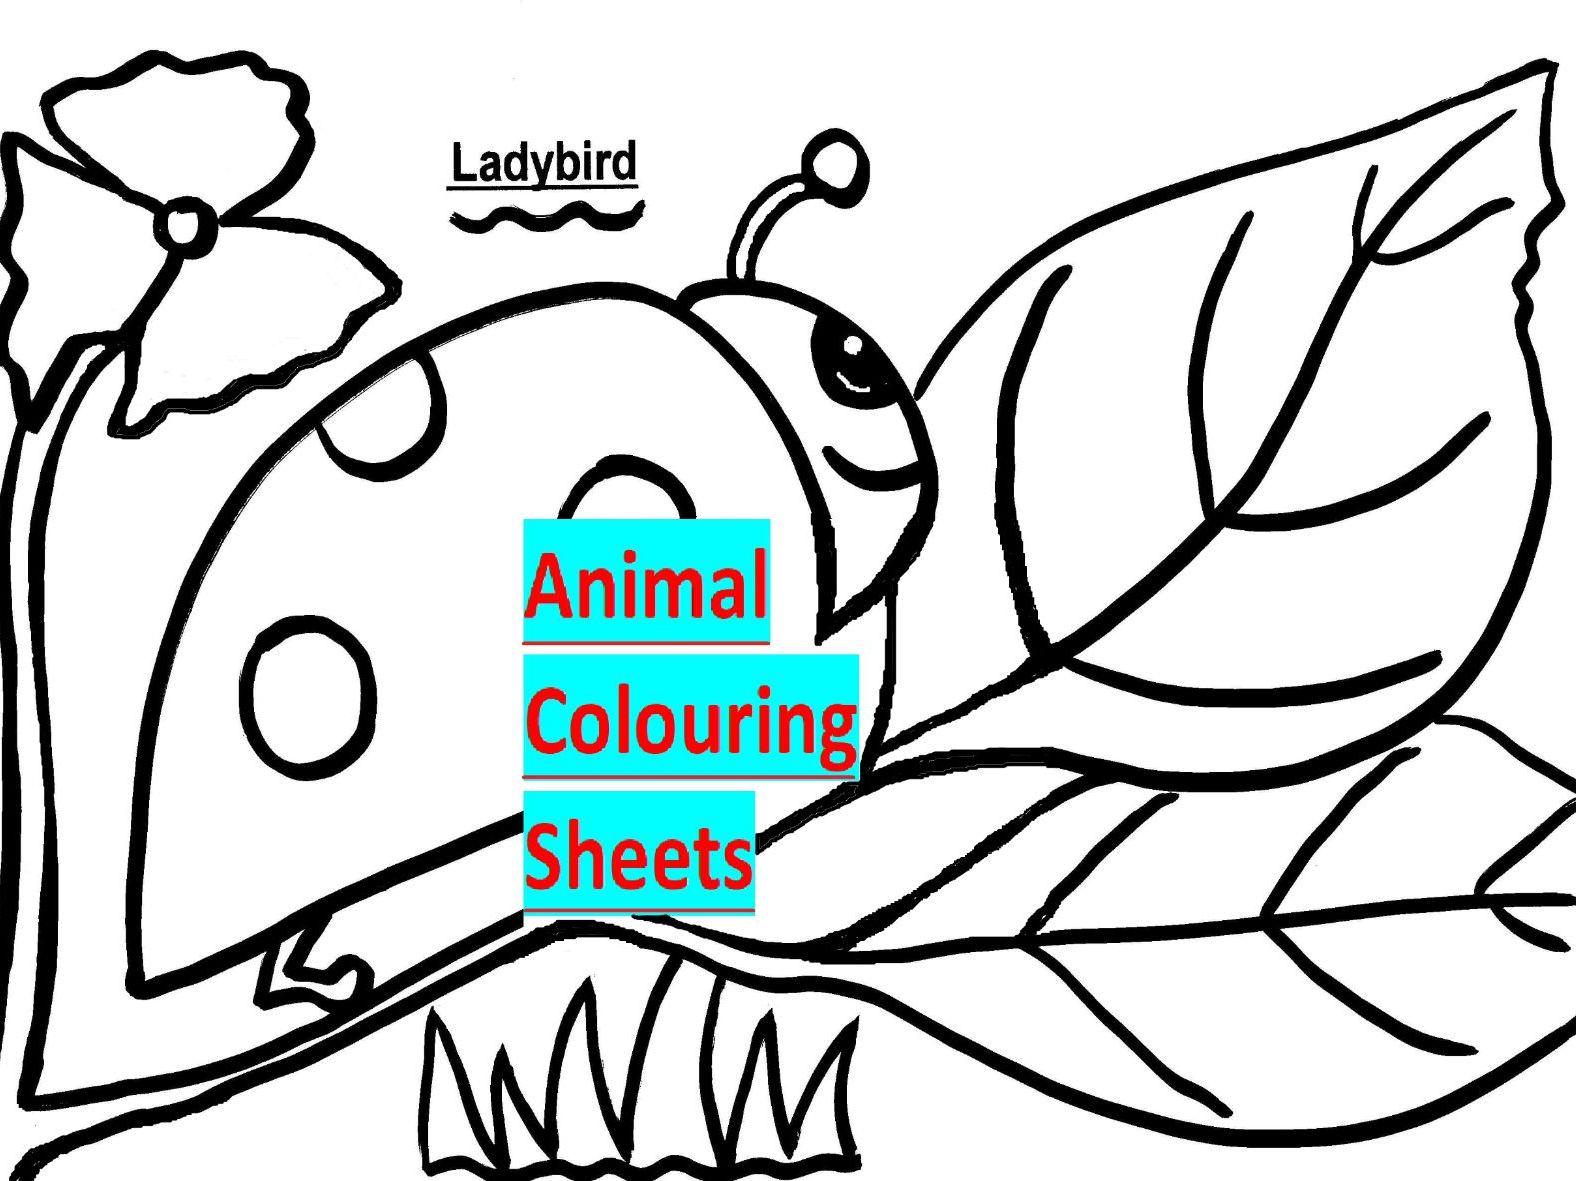 7 Animal Colouring Sheets